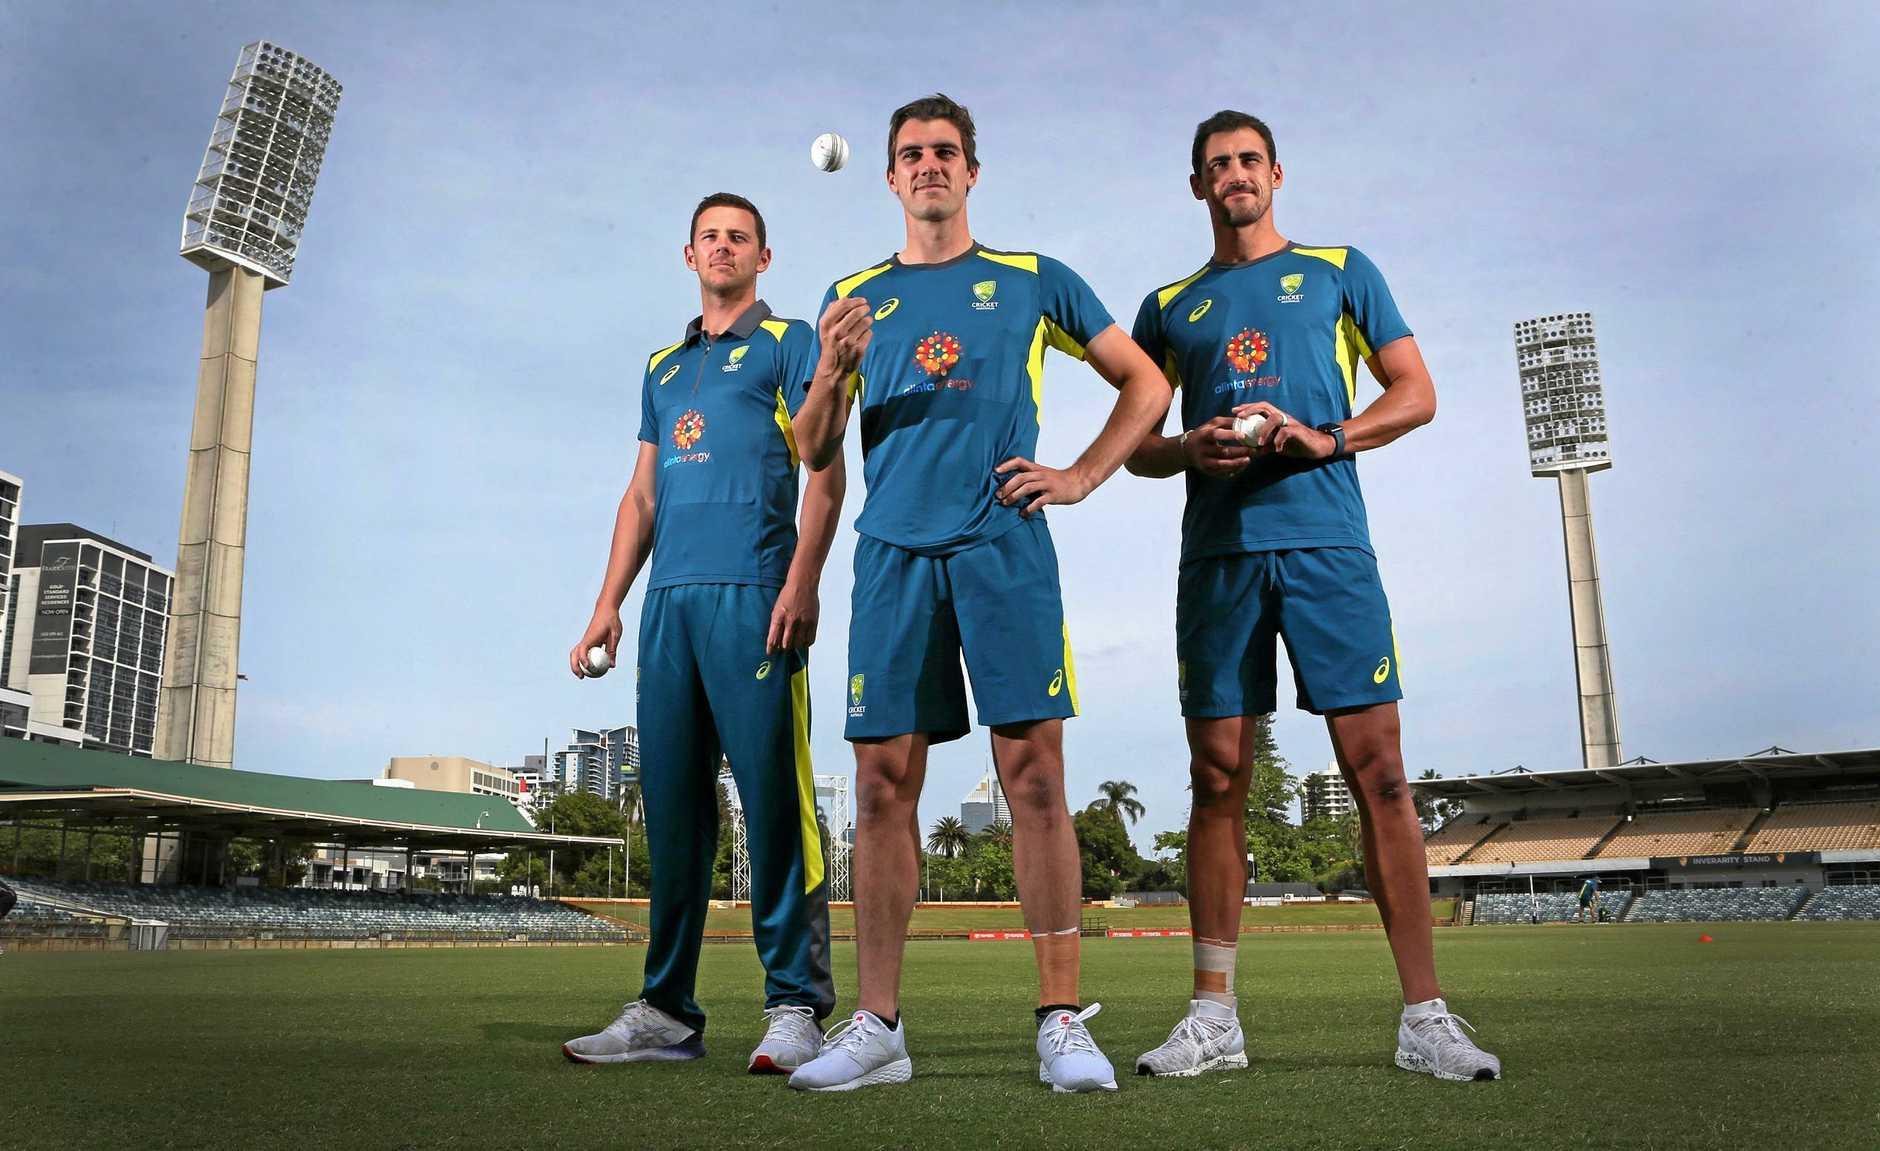 Key trio ... Australian bowlers Josh Hazlewood, Pat Cummins an Mitch Starc.